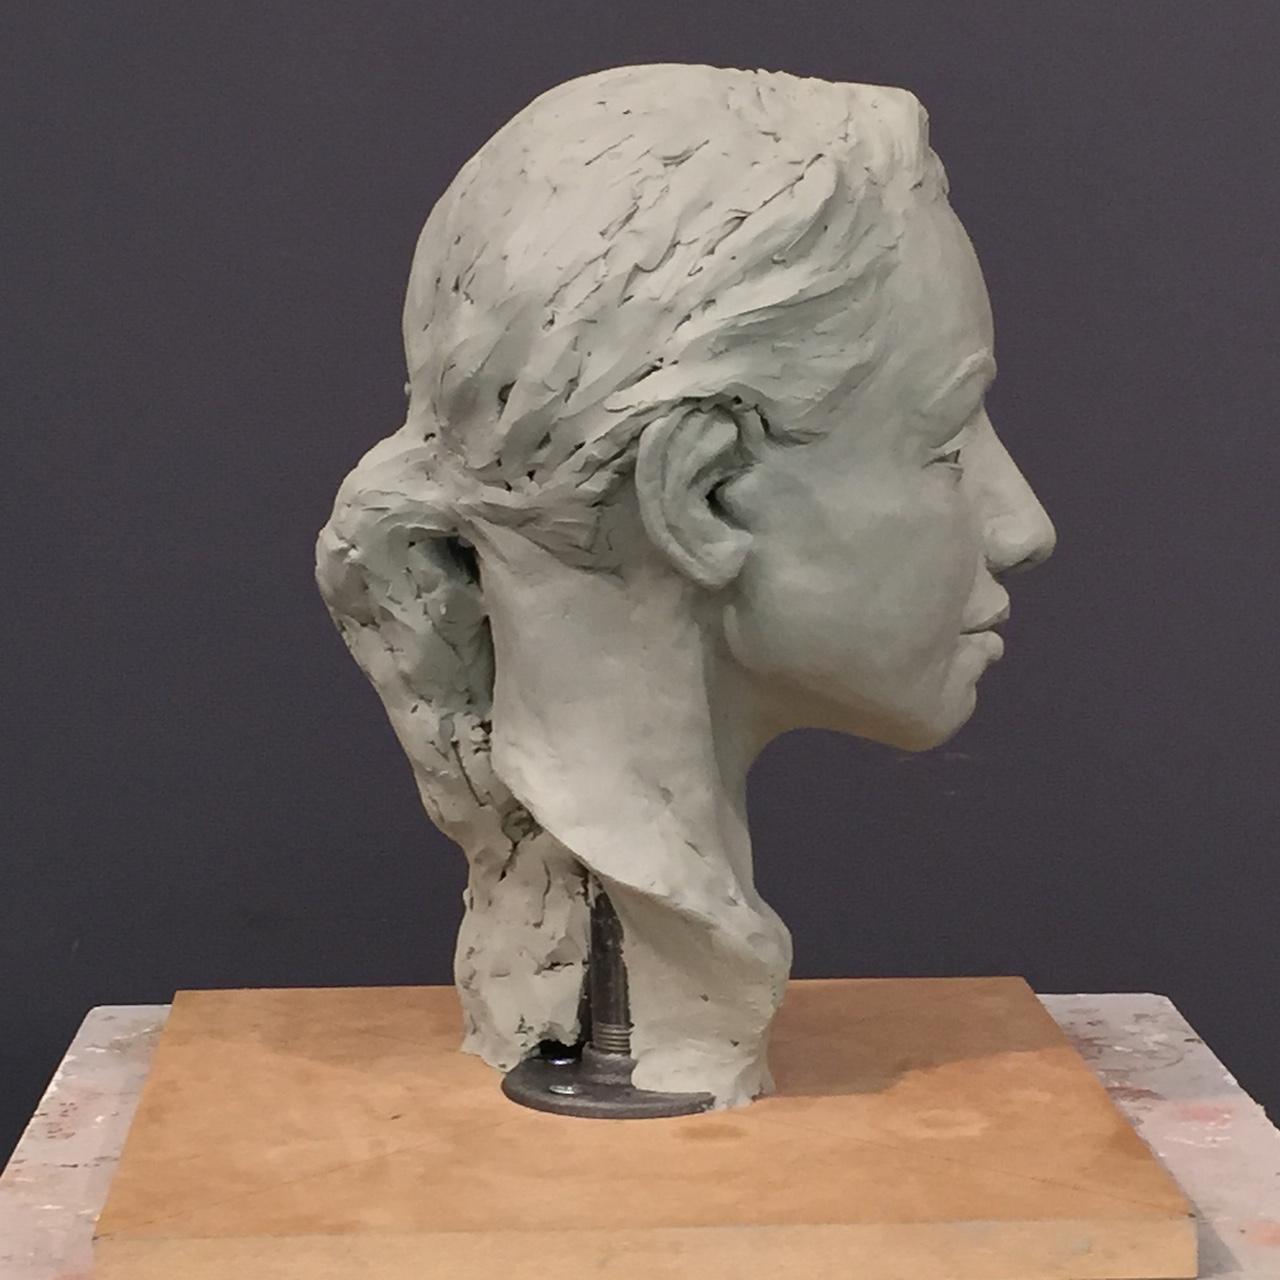 New York Academy of Art forensics (courtesy New York Academy of Art)